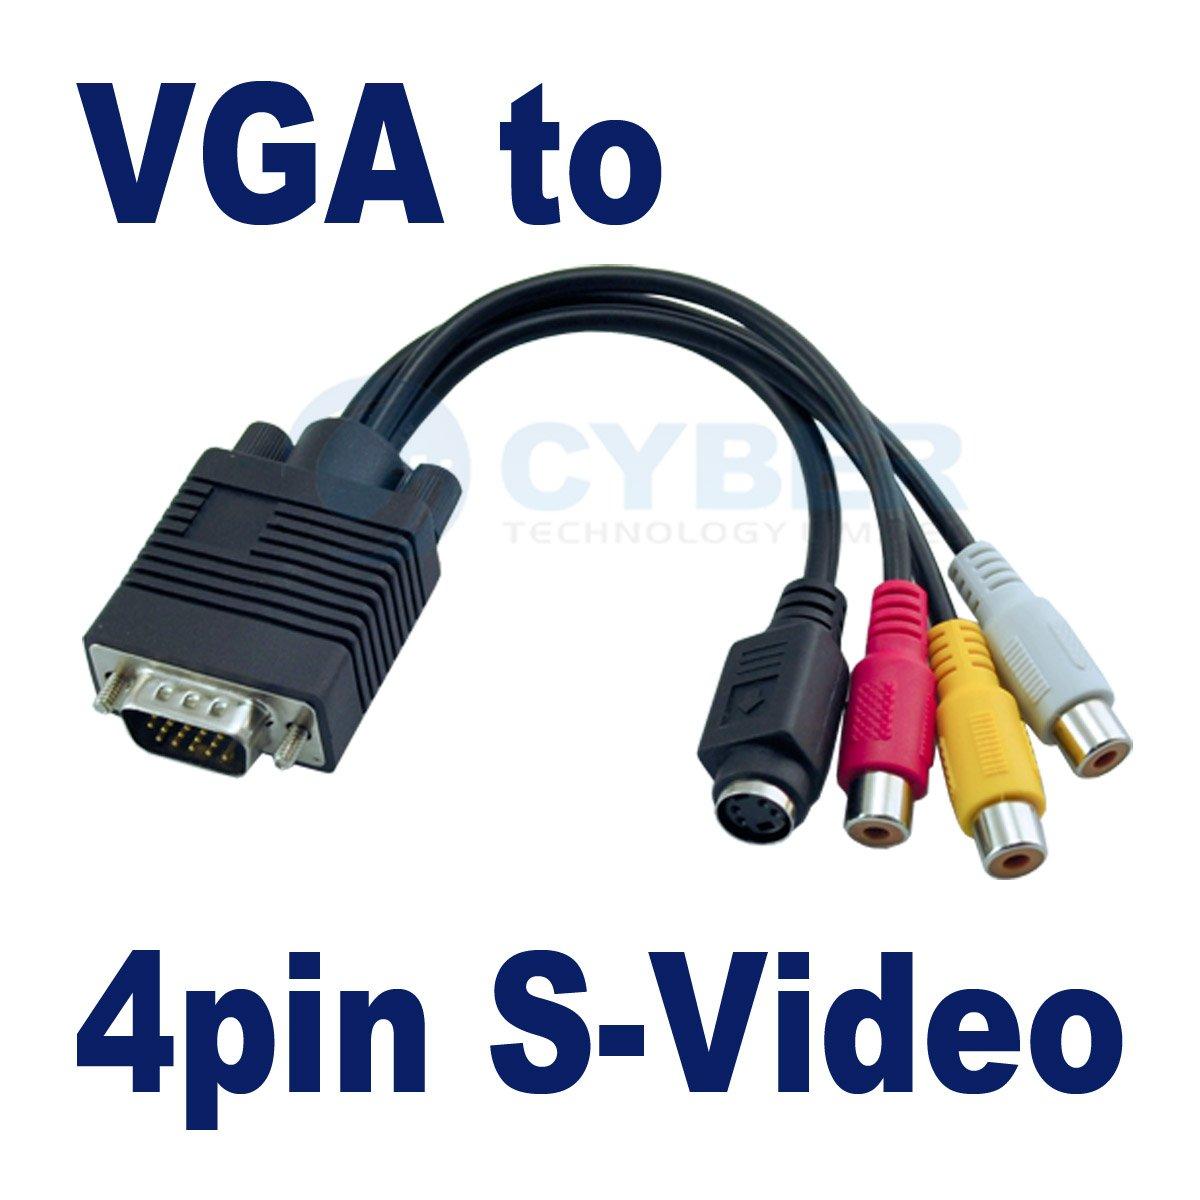 Vga Adapter Cable Vga to S-video 3 Rca Adapter